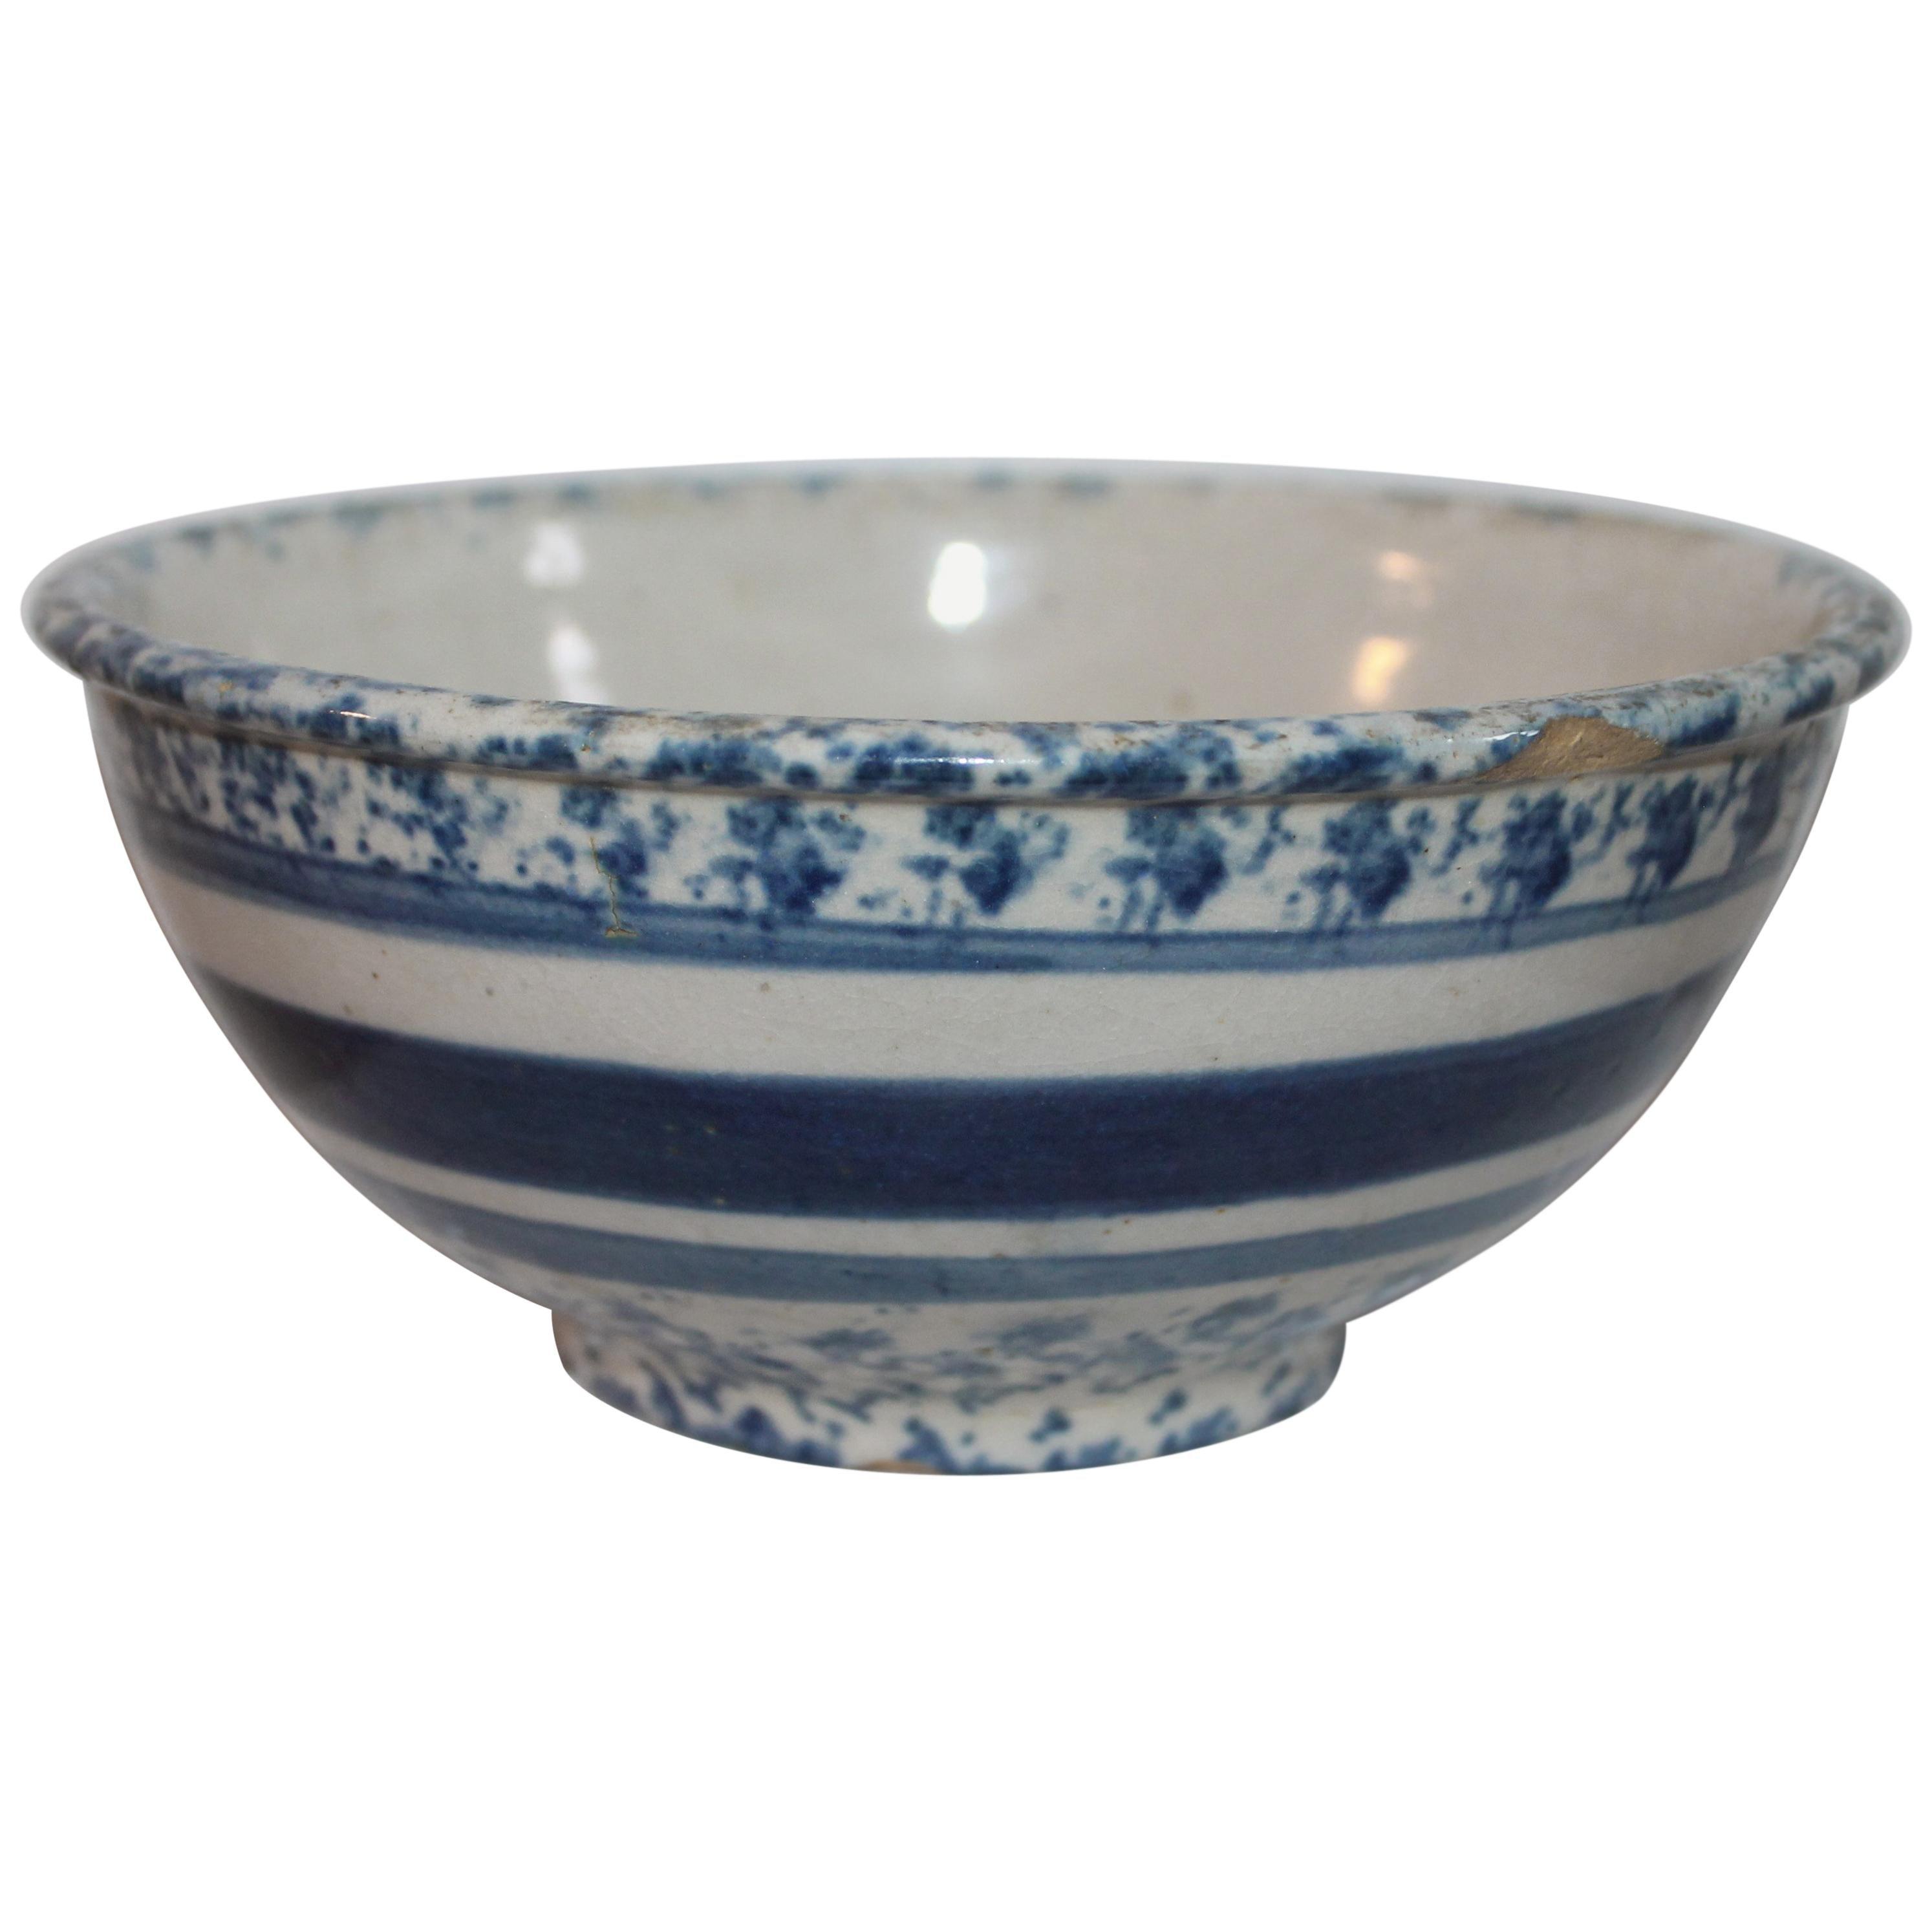 19th Century Spong Ware Bowl